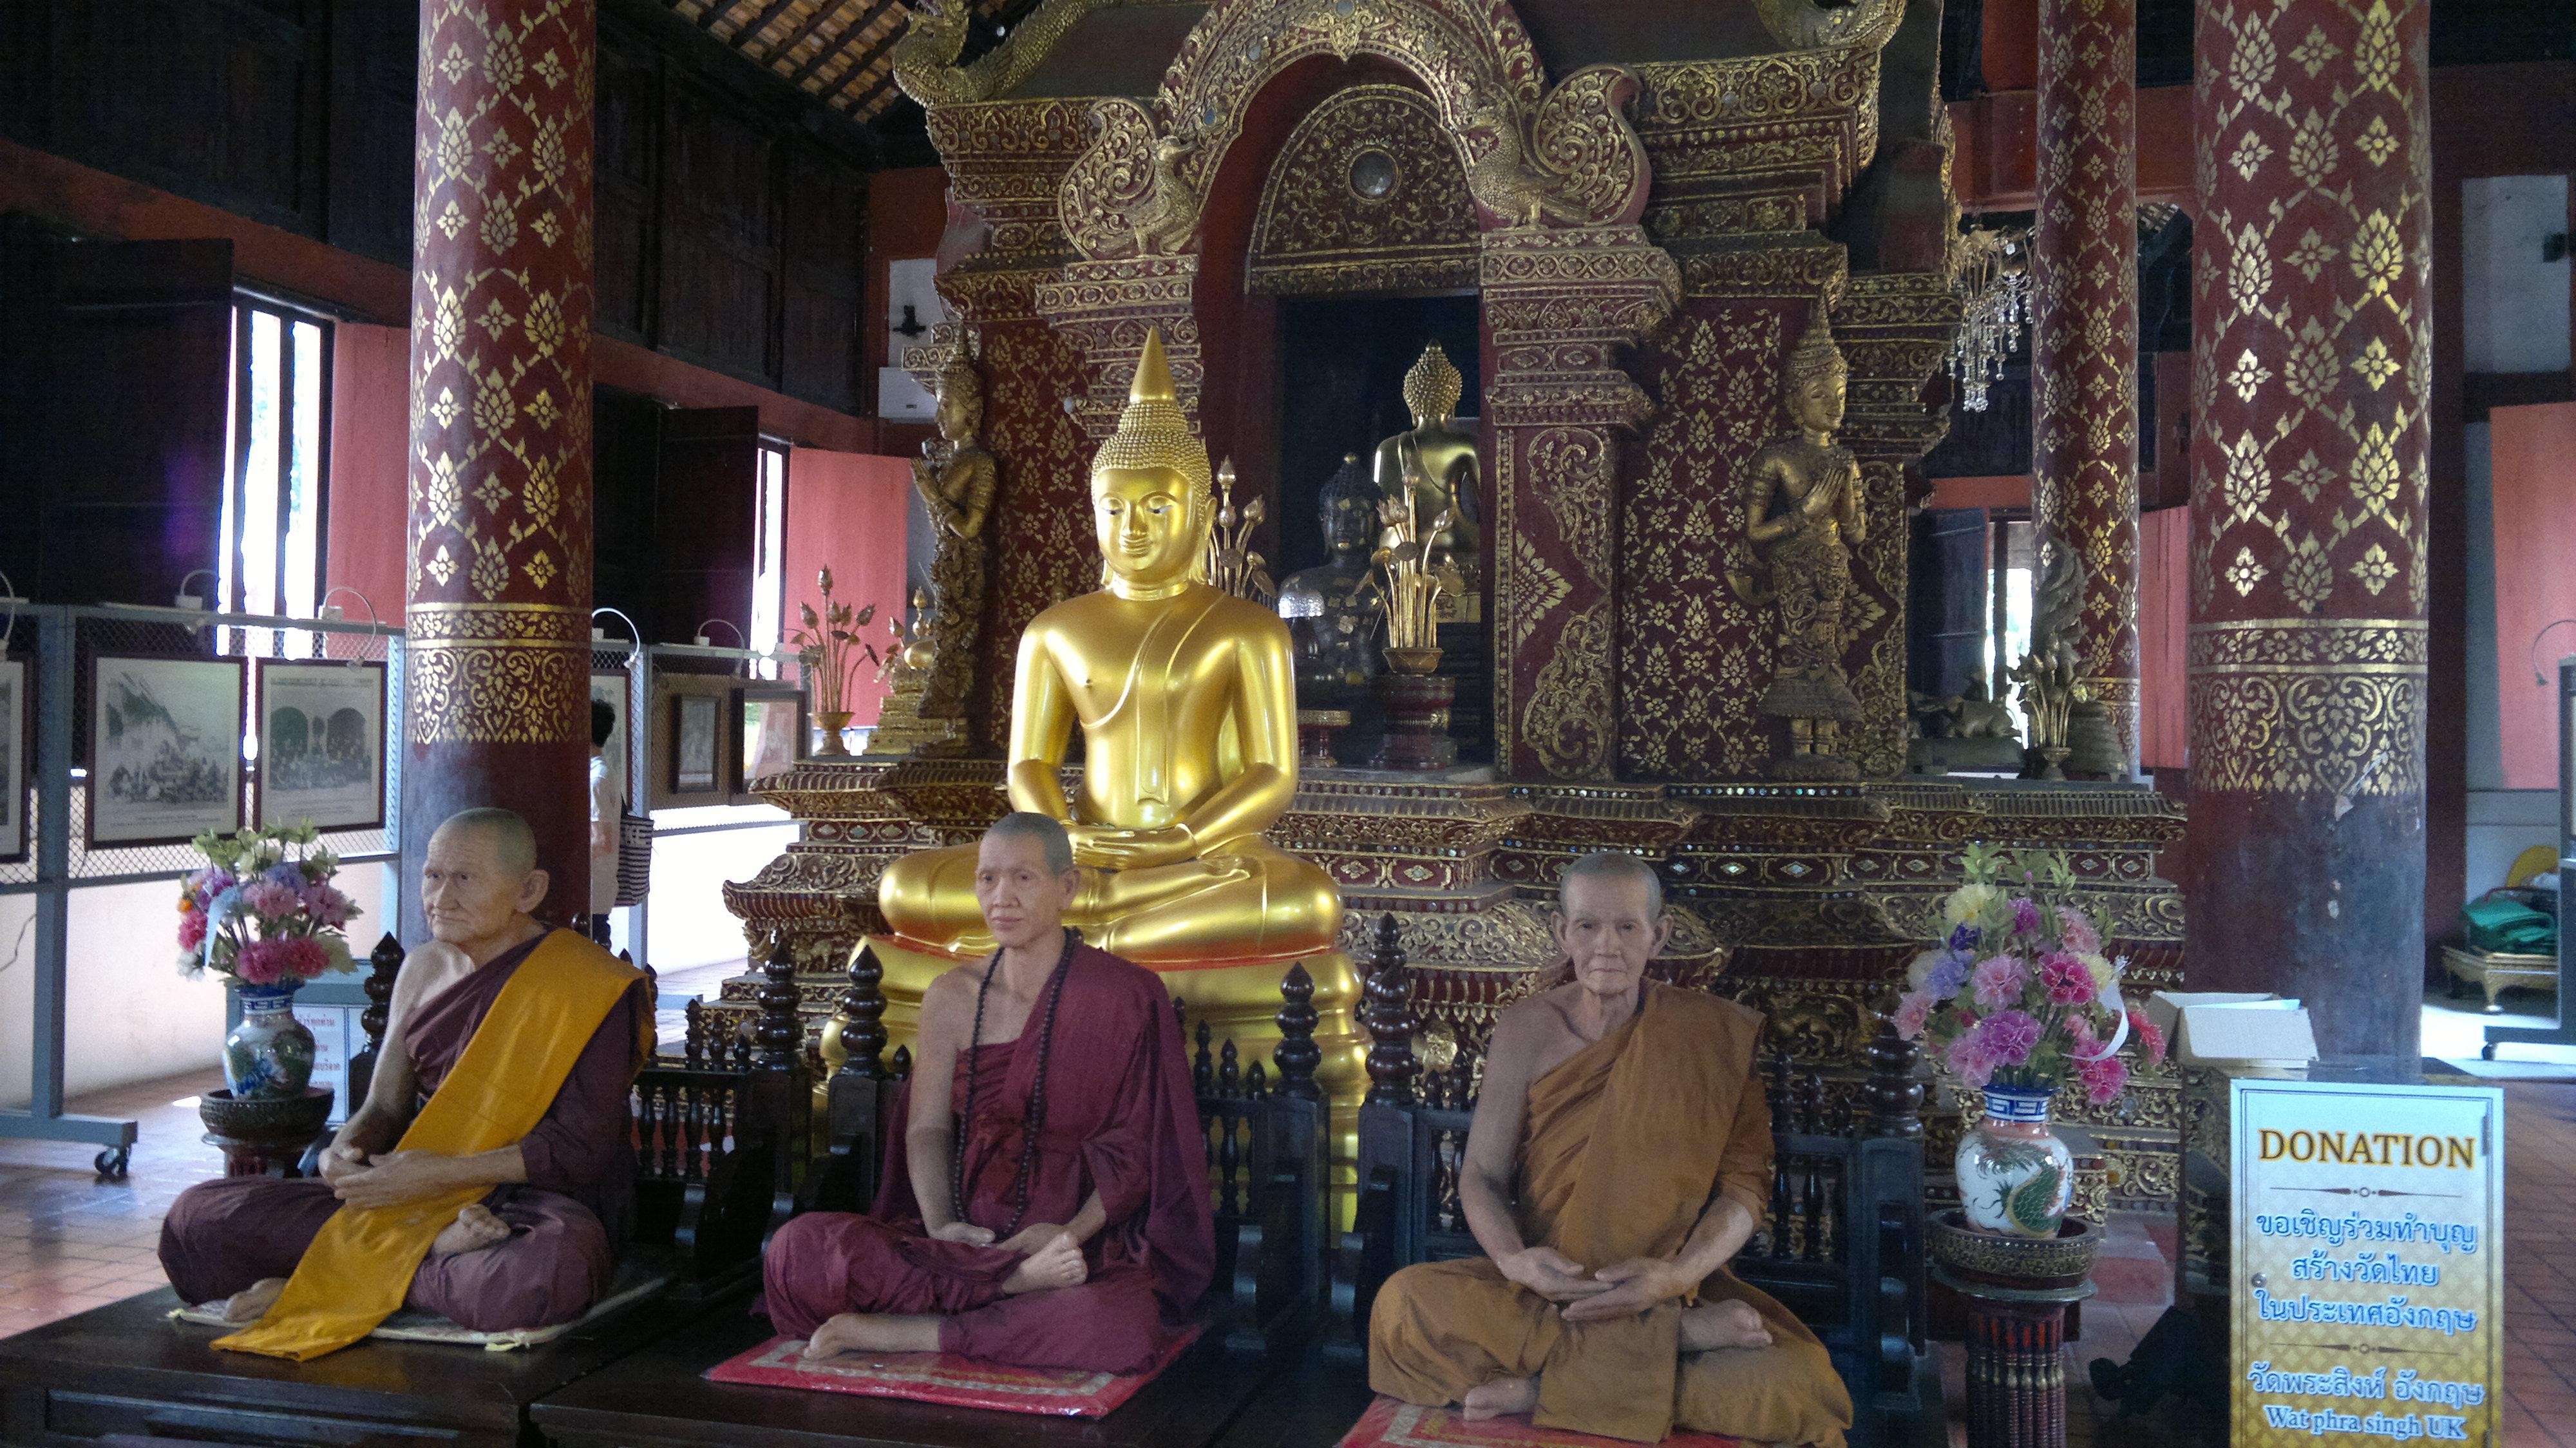 Wachsfiguren im Tempel